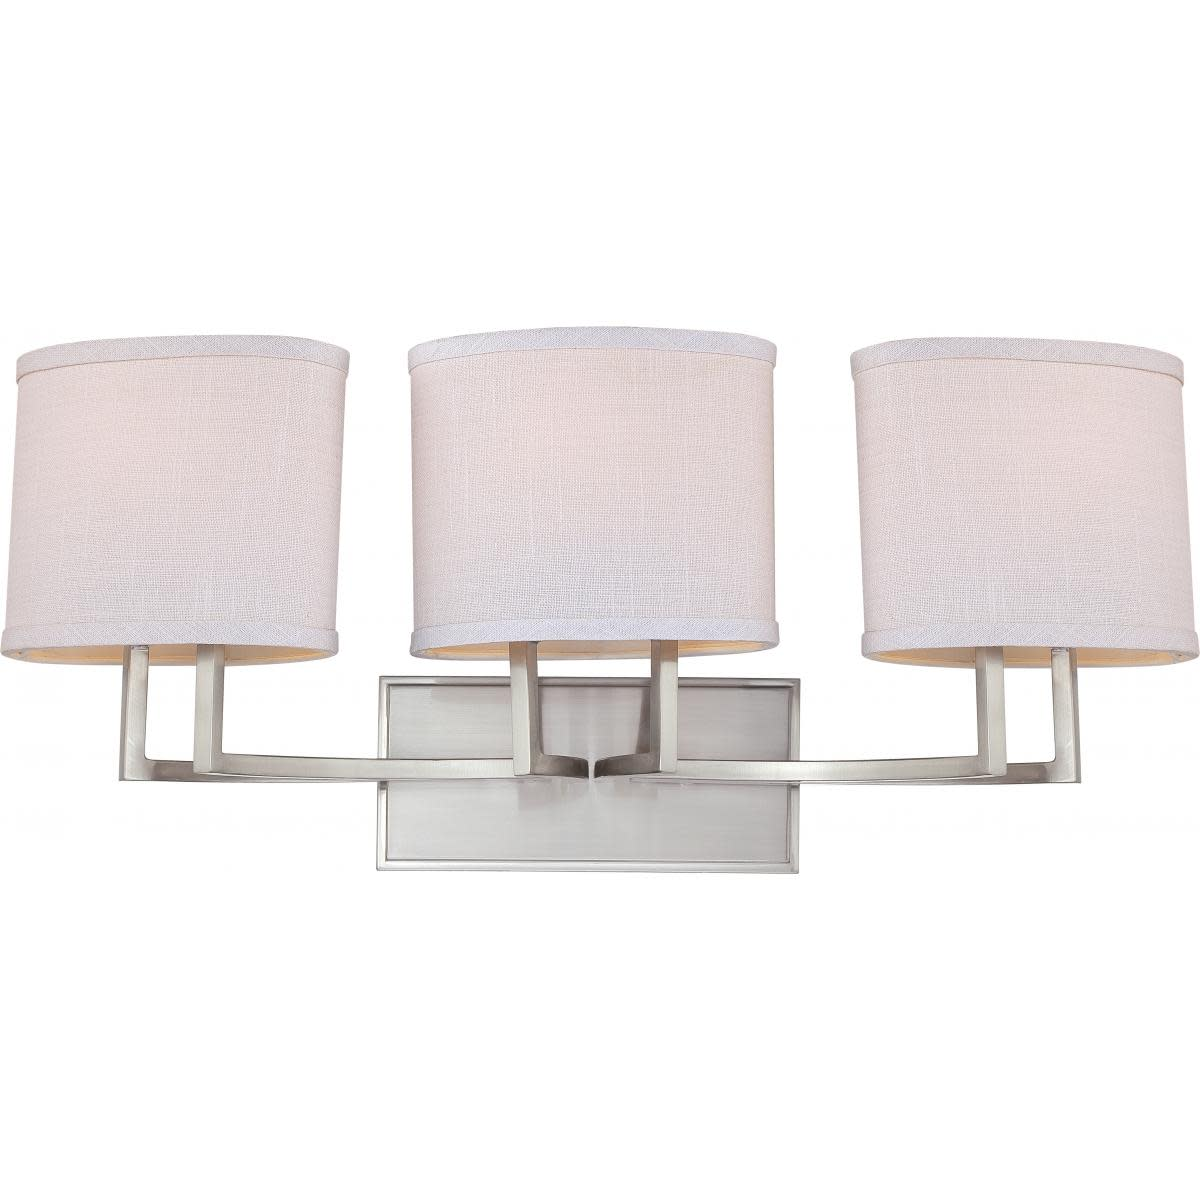 Nuvo Lighting 60 4753 Gemini 3 Light 27 1 4 W Bathroom Vanity Nickel 45923647536 Ebay